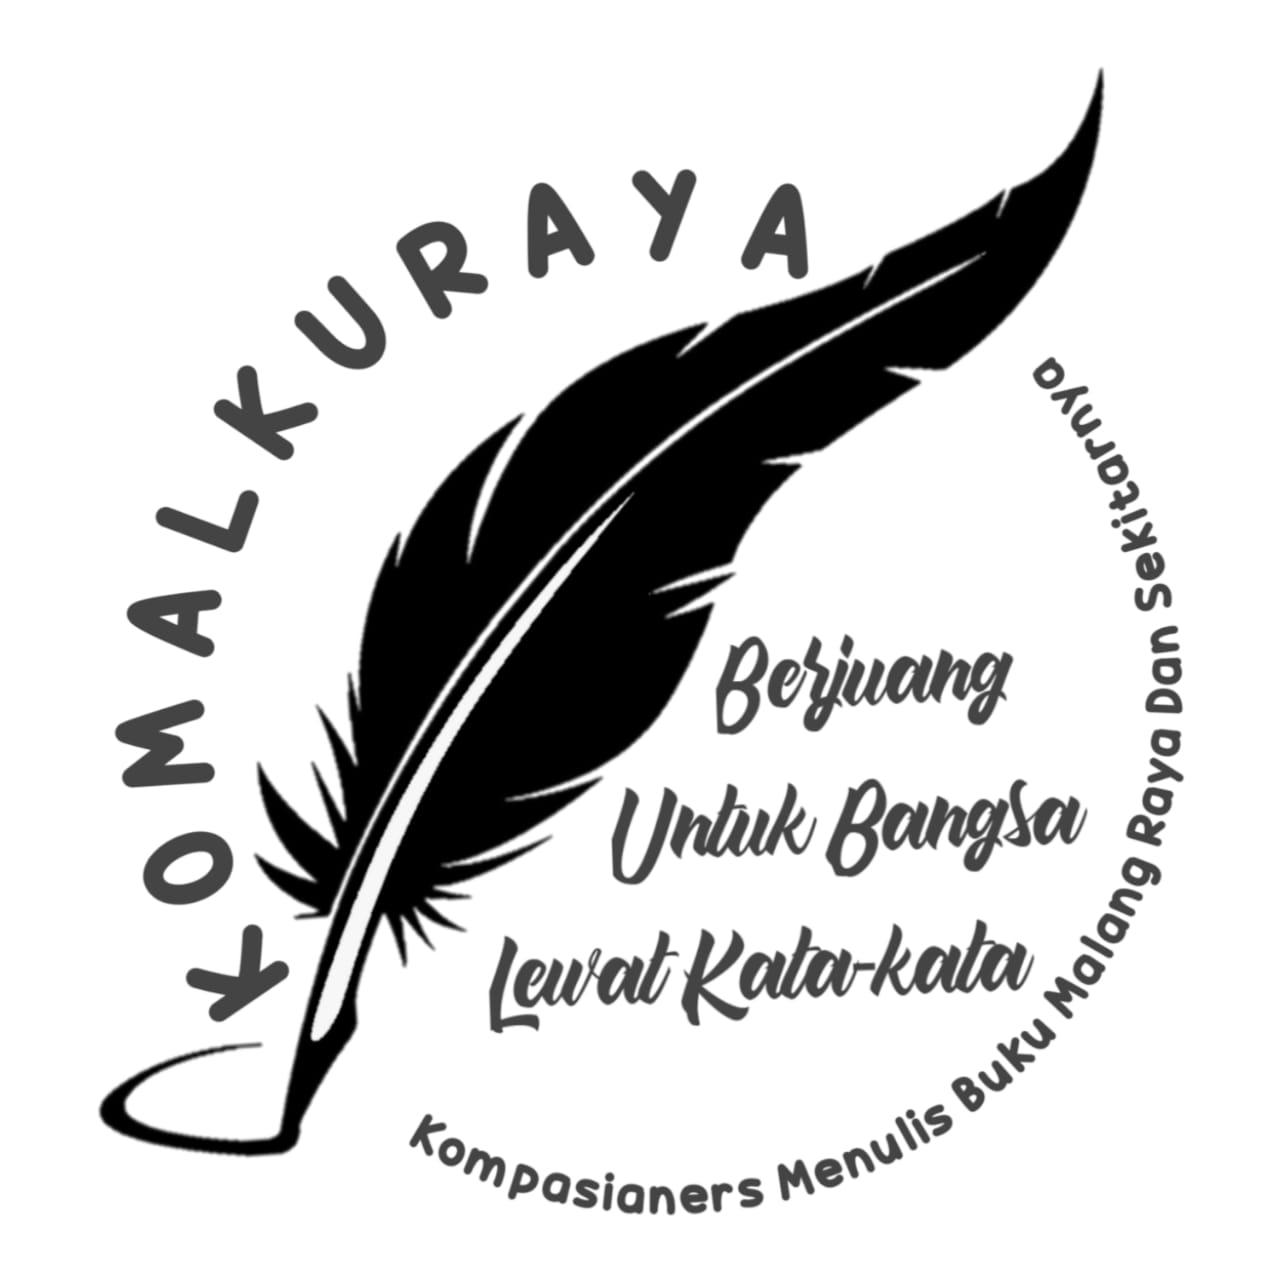 items/kaleidoskop_2020/komalku-raya-1607603724.jpg